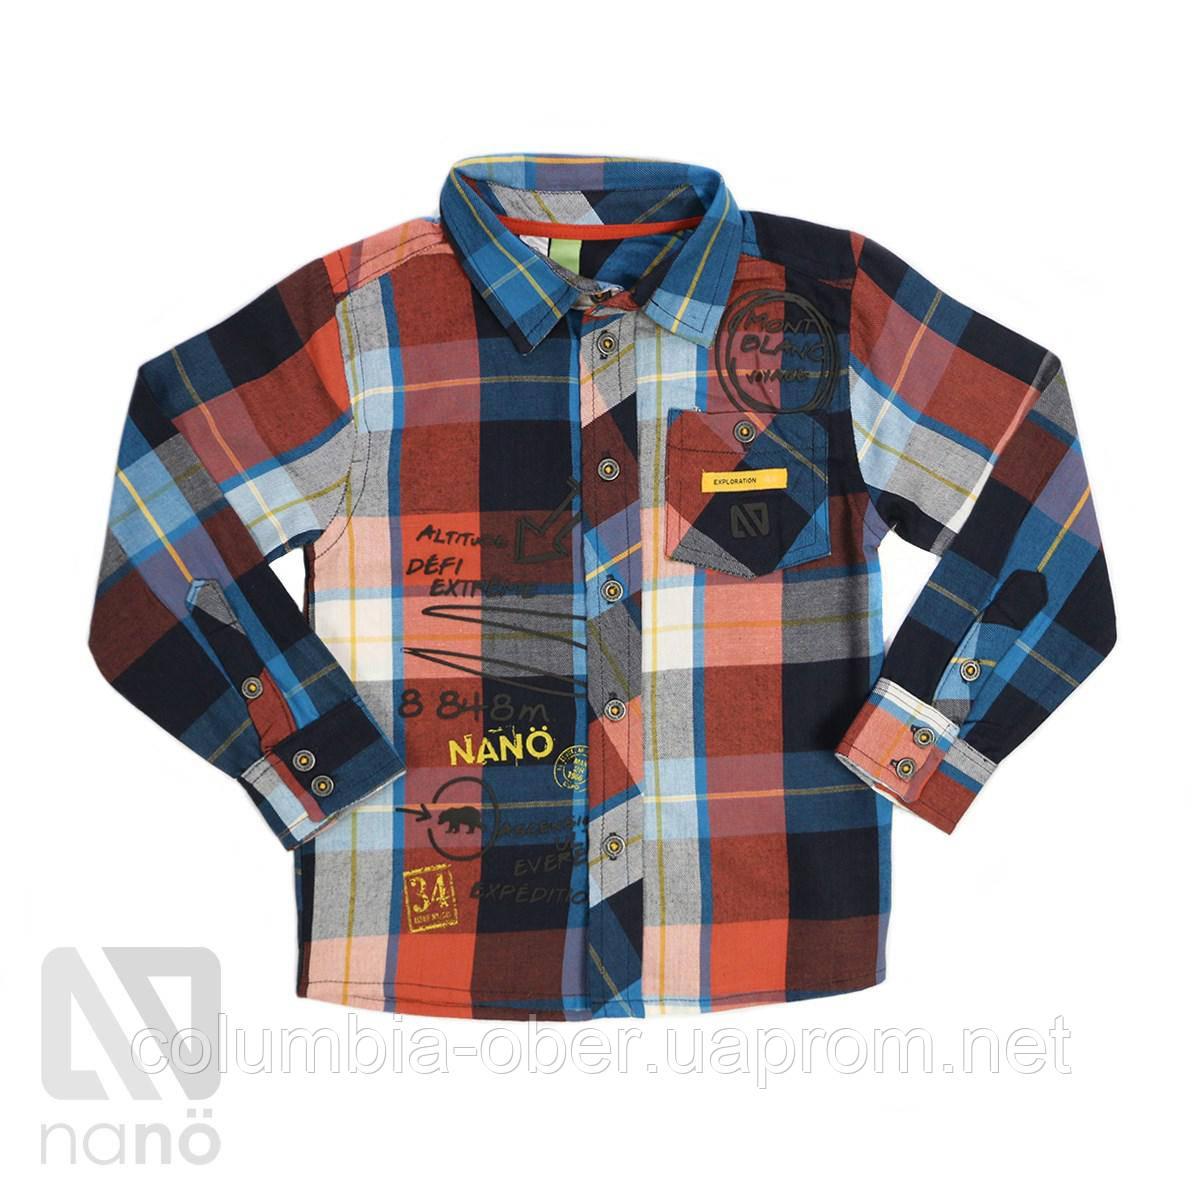 Рубашка для мальчика Nano F1403-04 Plaid. Размеры 92-135.